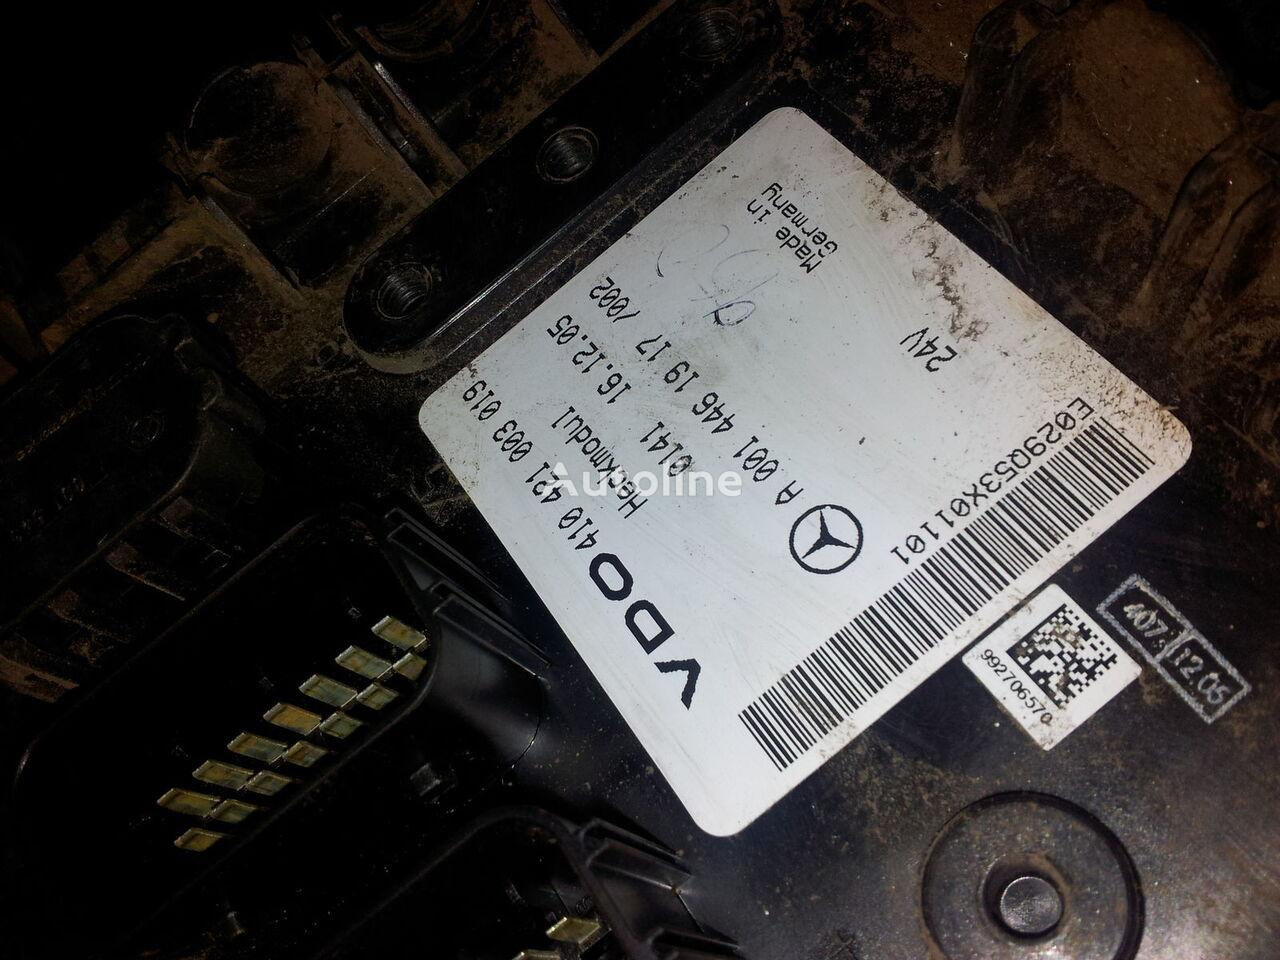 MB Actros MP2, MP3, Heckmodul, control unit, EDC, ECU, rear module electronics, 0014461917, 0014462817, 0014462017,0014461917,0014462717,0014461617, 41021003020, 410421003019, 0014462817 unitate de control pentru MERCEDES-BENZ Actros MP2; MP3 autotractor